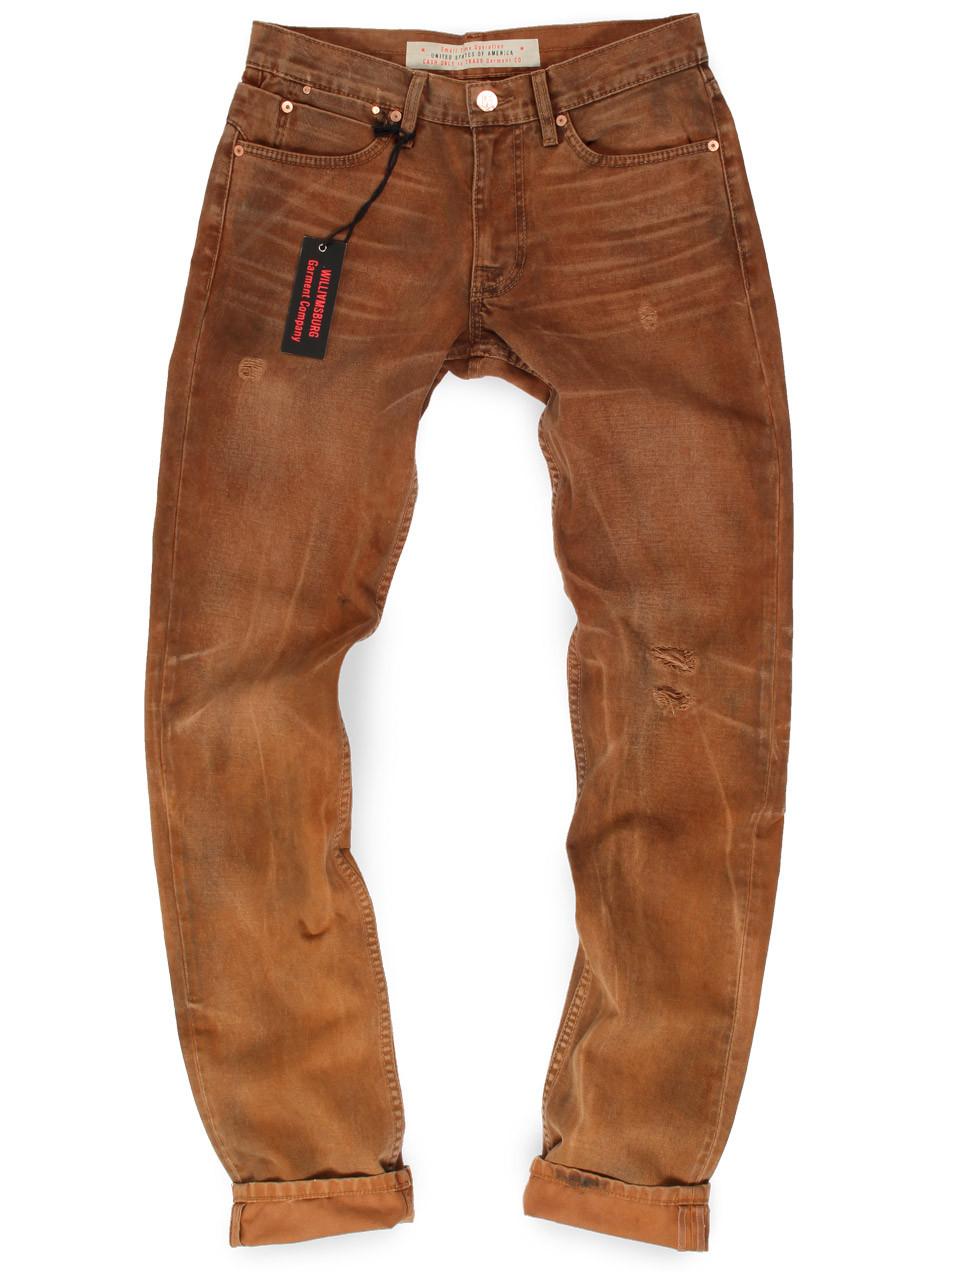 Vintage Wash Khaki Work Jeans Made In Usa Williamsburg